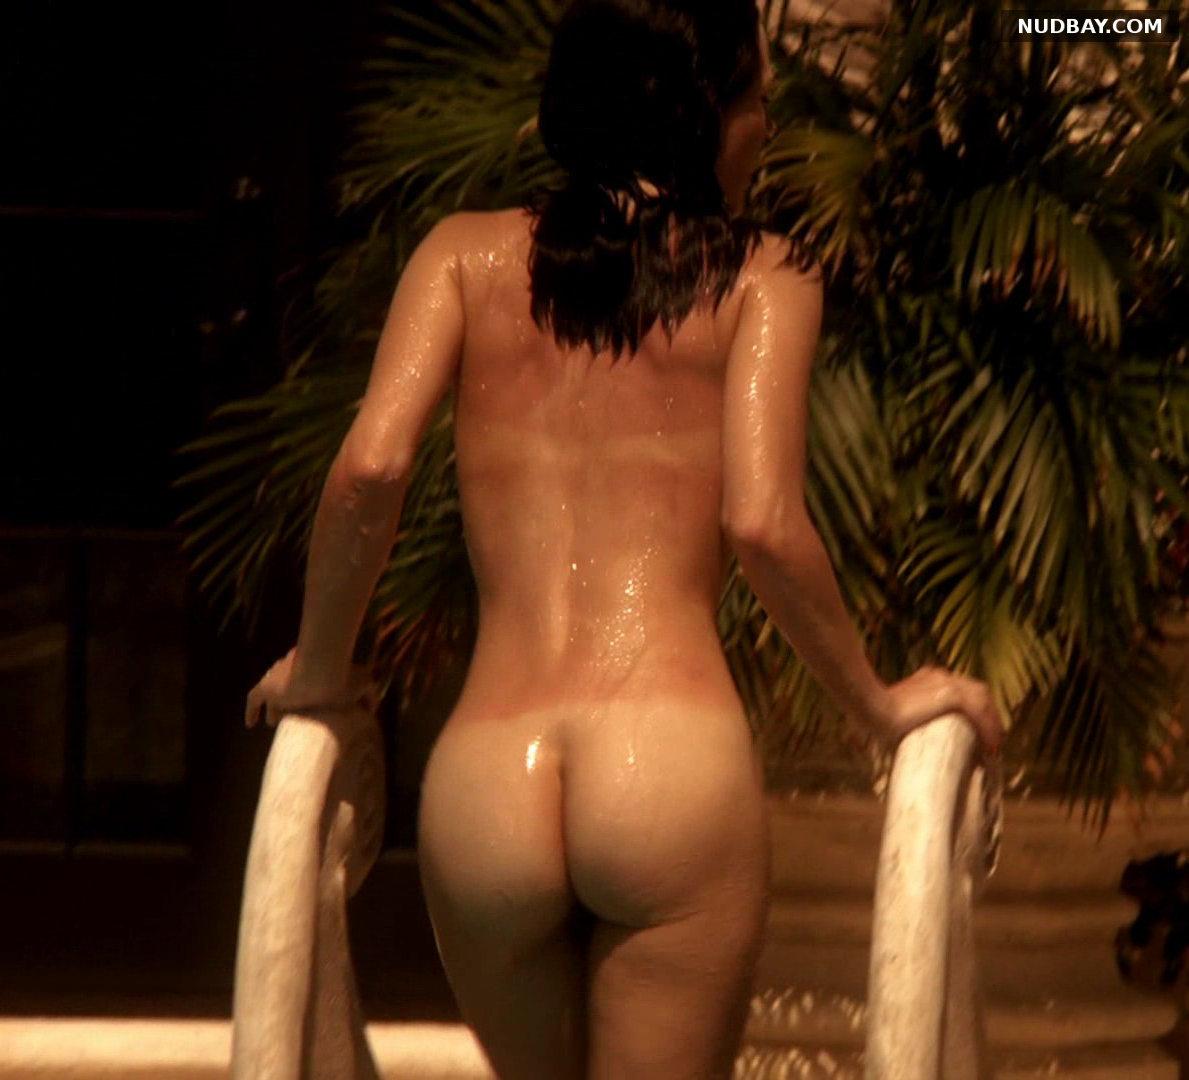 Jessica Marais bare ass in Magic City s01e01 (US 2012)